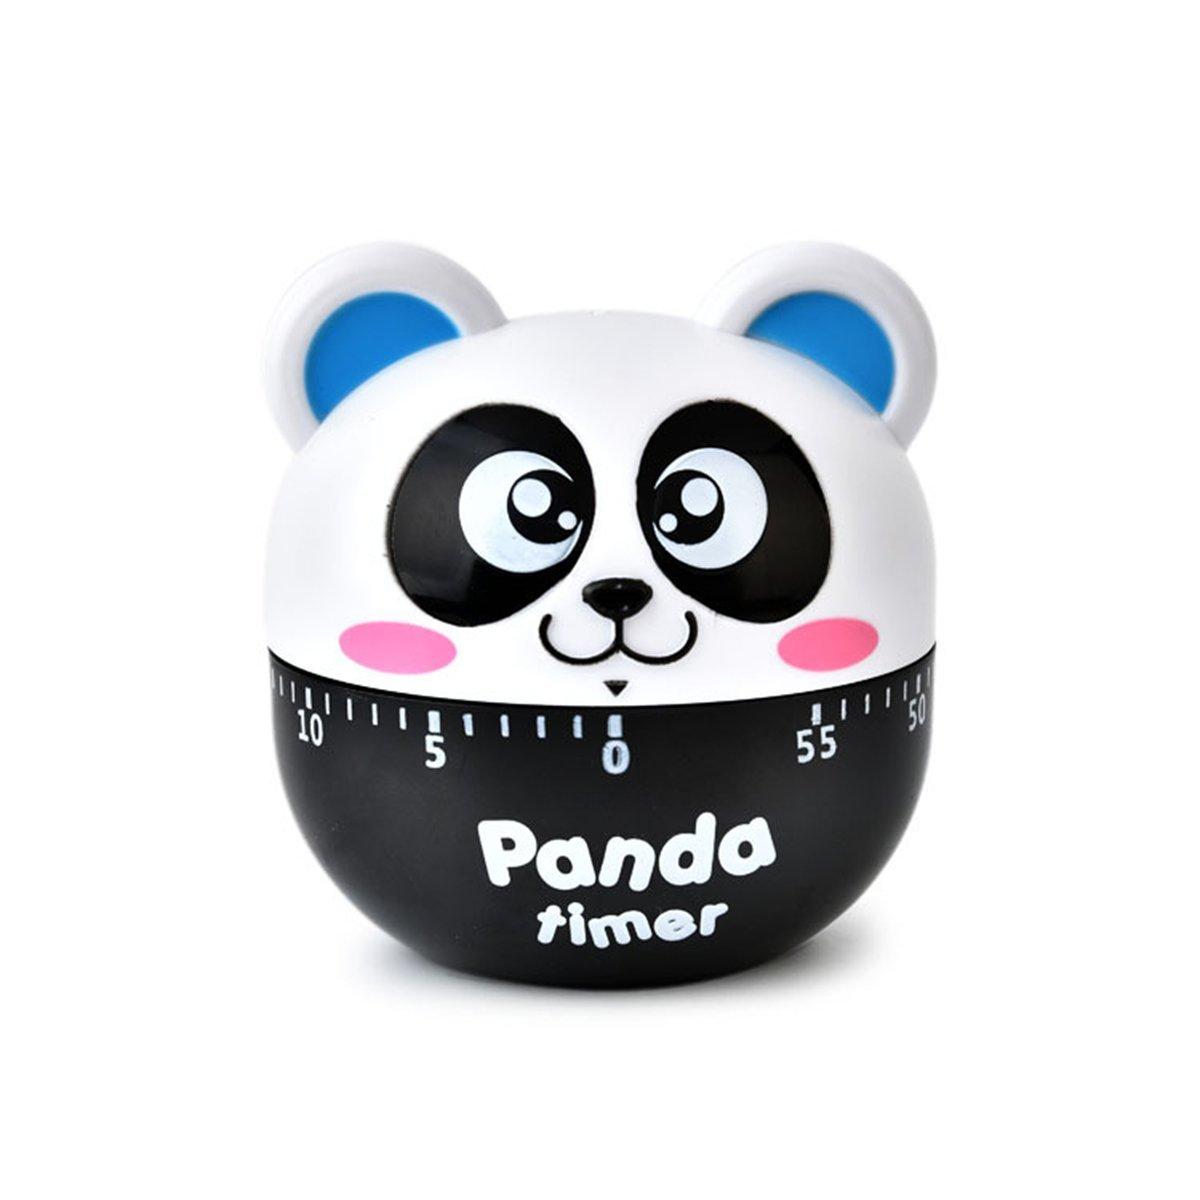 Kids Mechanical Countdown Timer,Lovely Panda Animal Kitchen Timer(Blue)